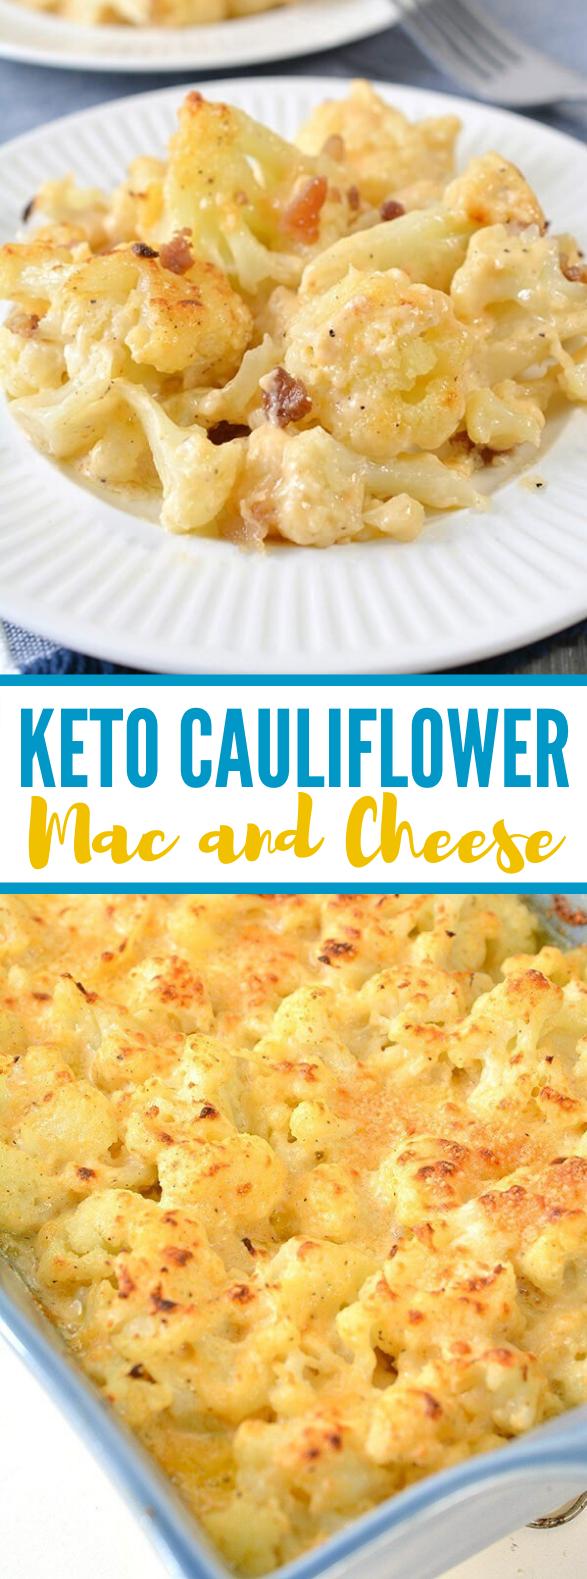 KETO CAULIFLOWER MAC AND CHEESE #healthy #lowcarb